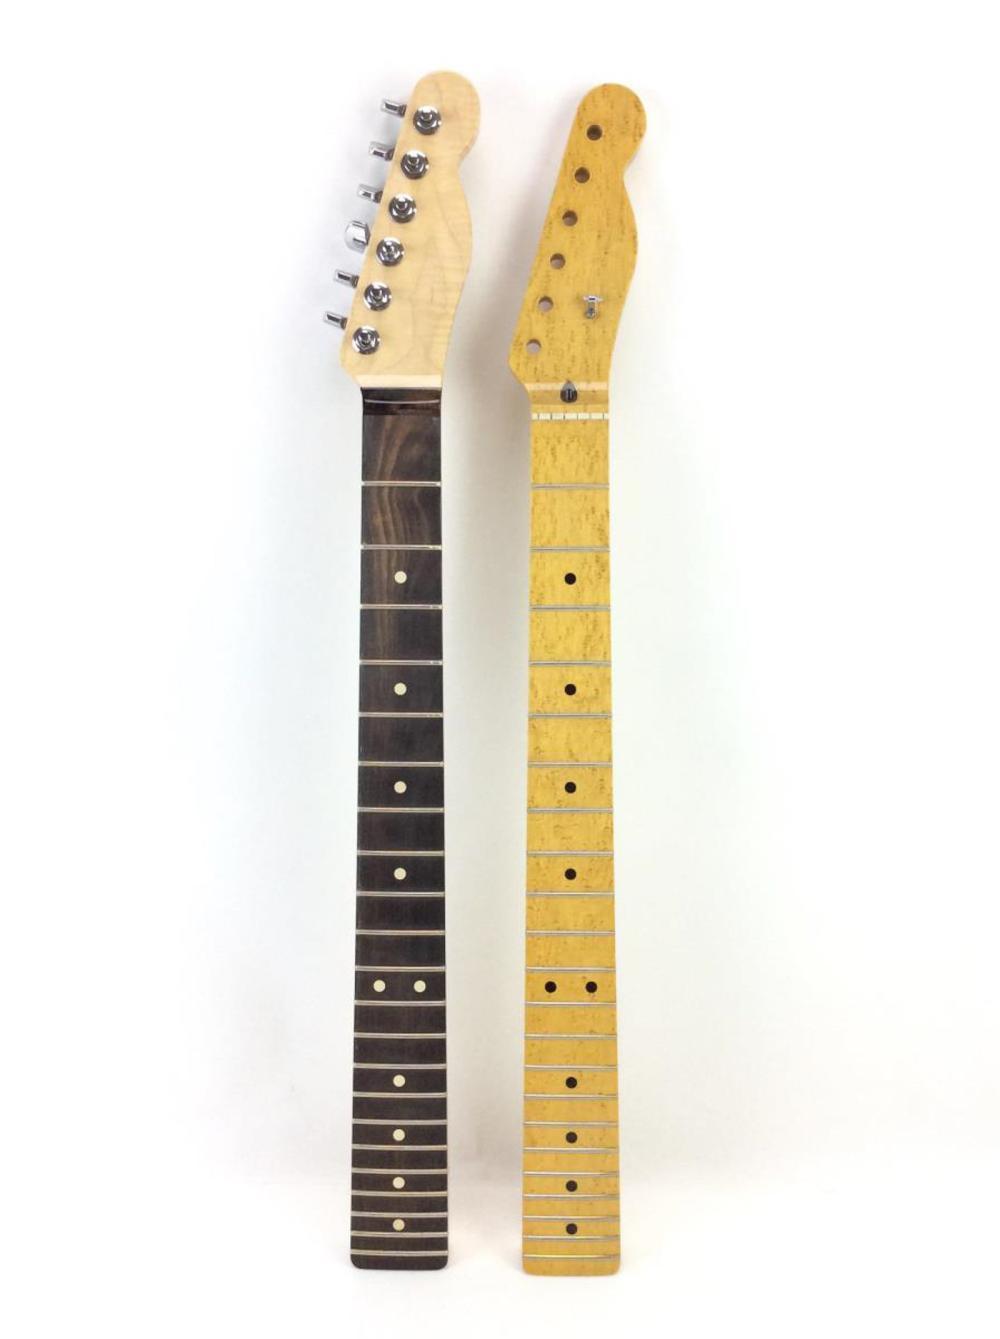 2pc Fender Warmoth Radius Guitar Necks